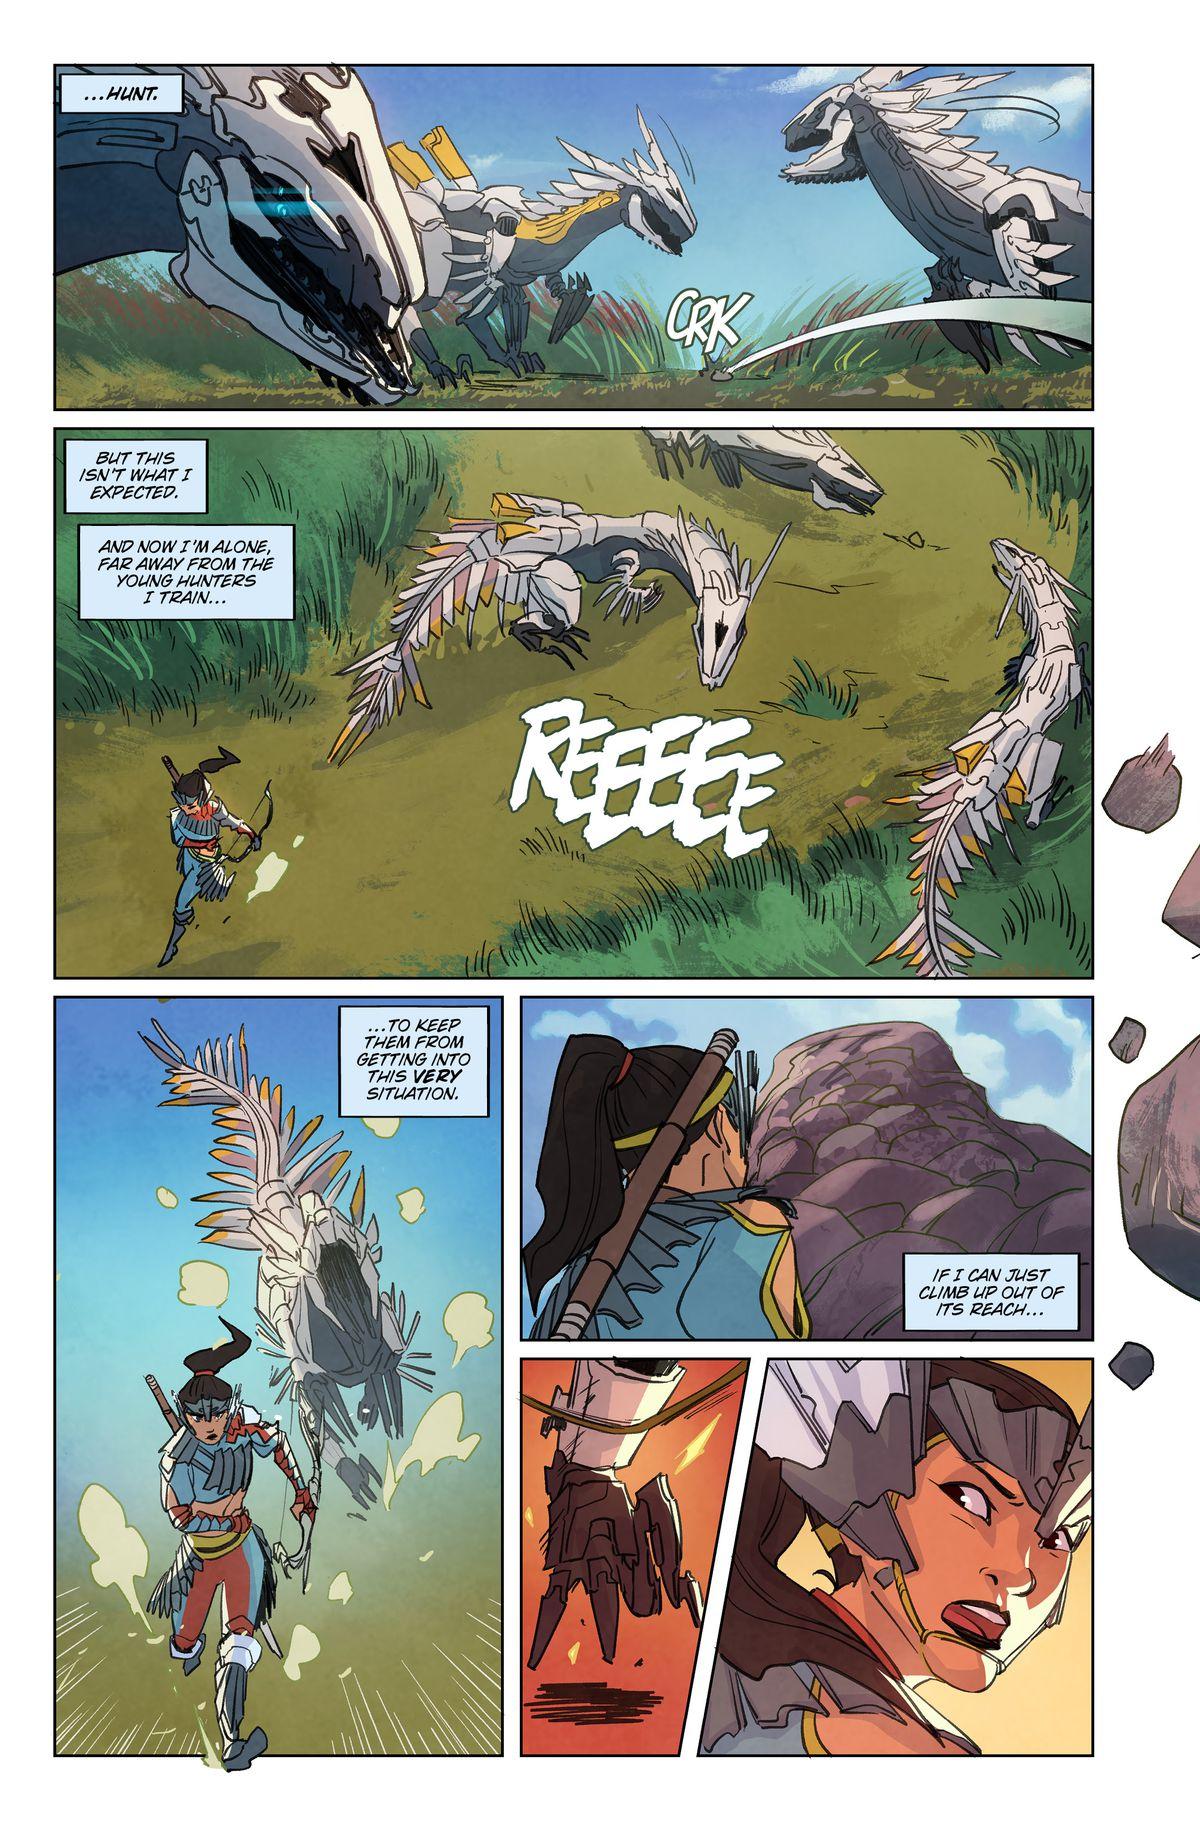 Mechanical dragon-like beasts fighting in Horizon Zero Dawn #1, Titan Comics (2020)